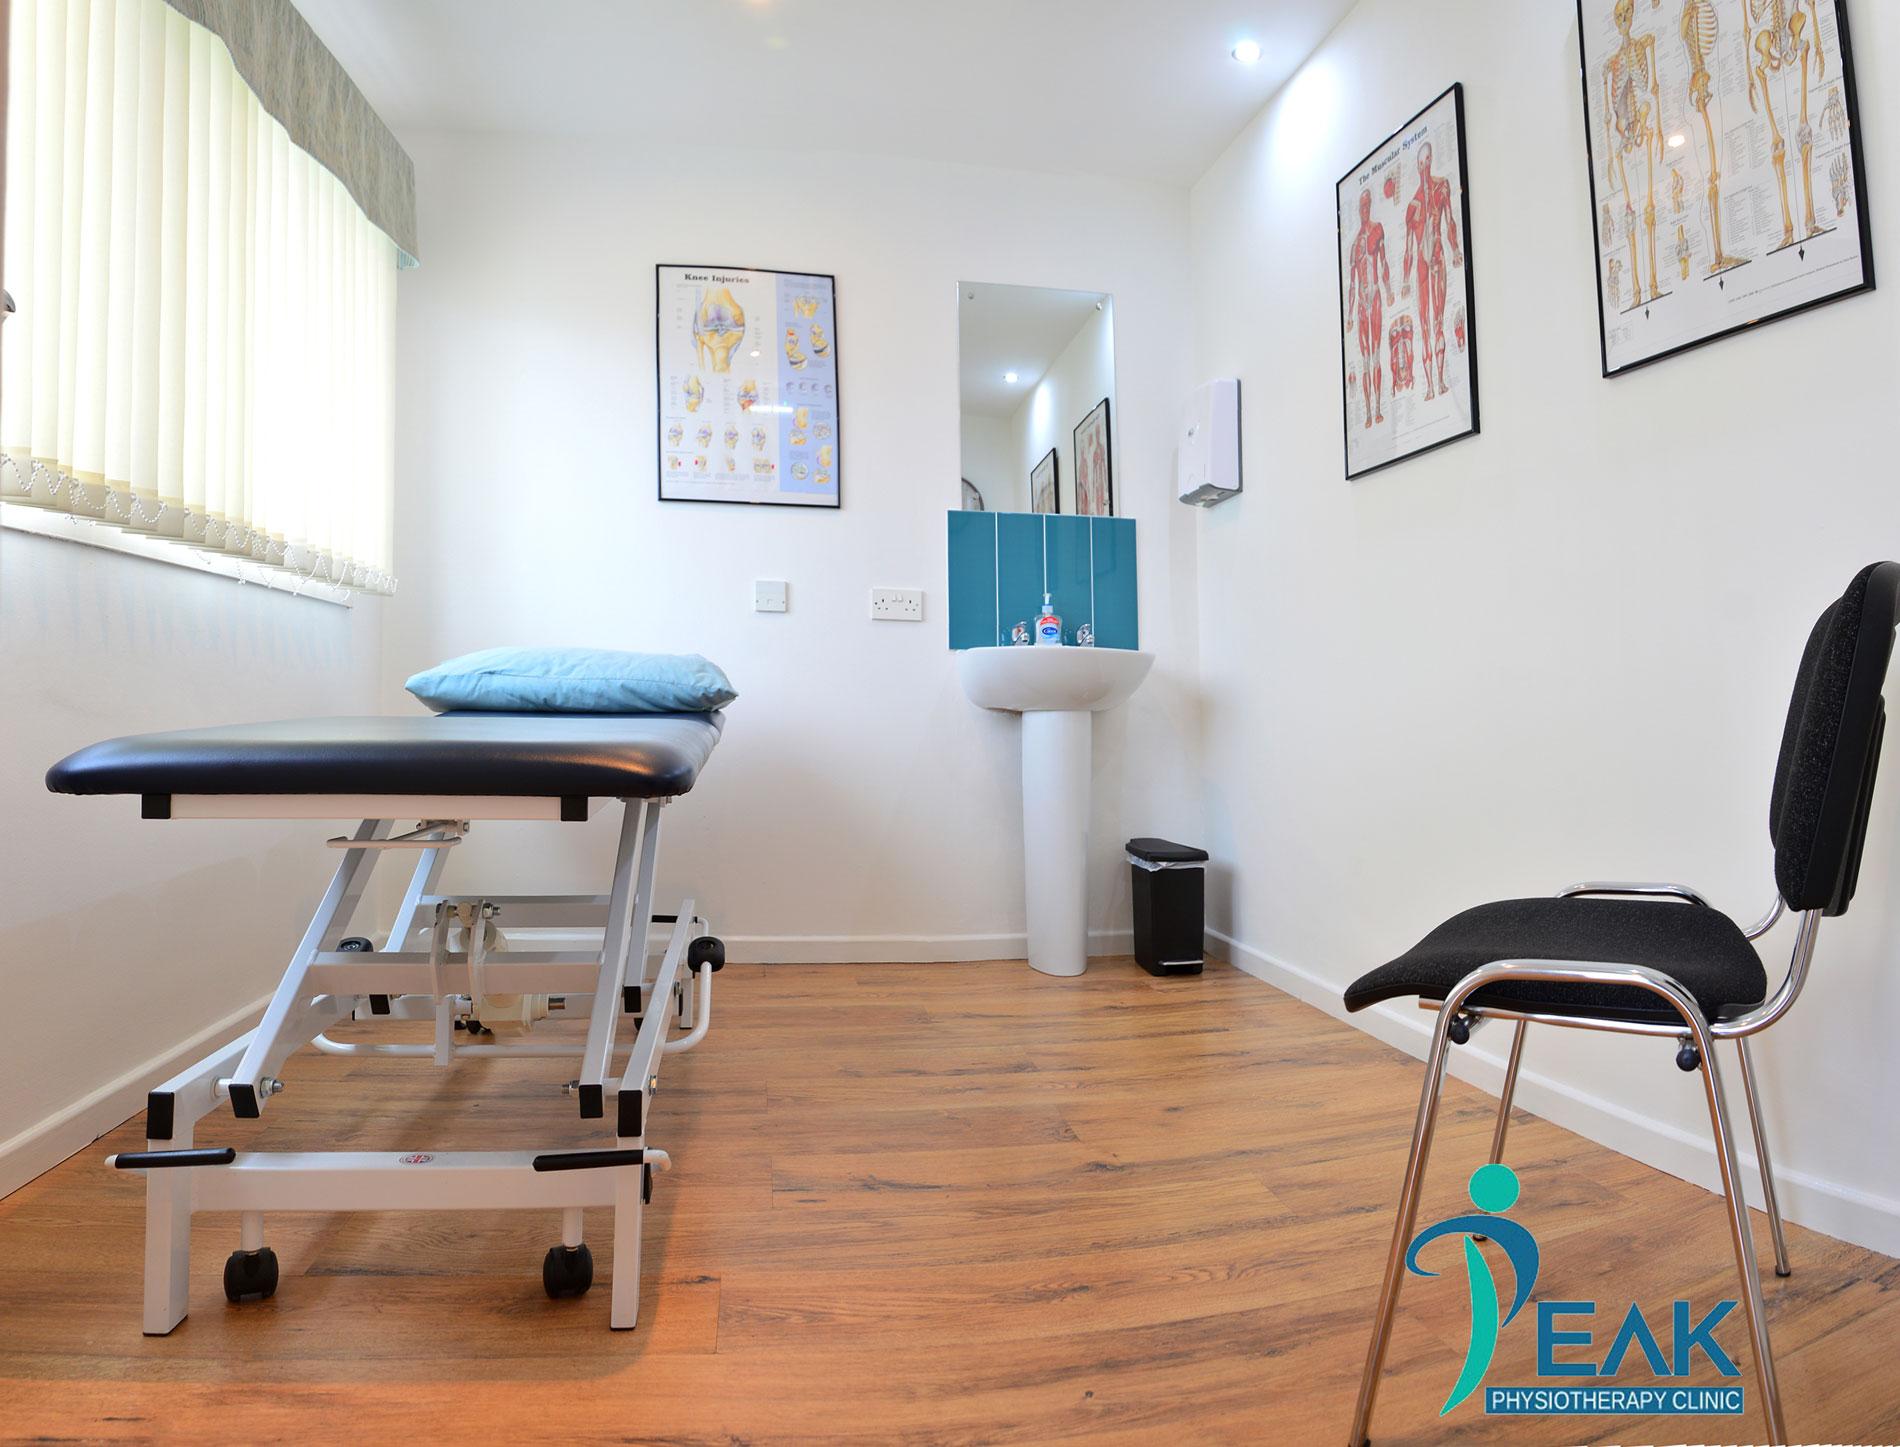 Peak Physio Clinic